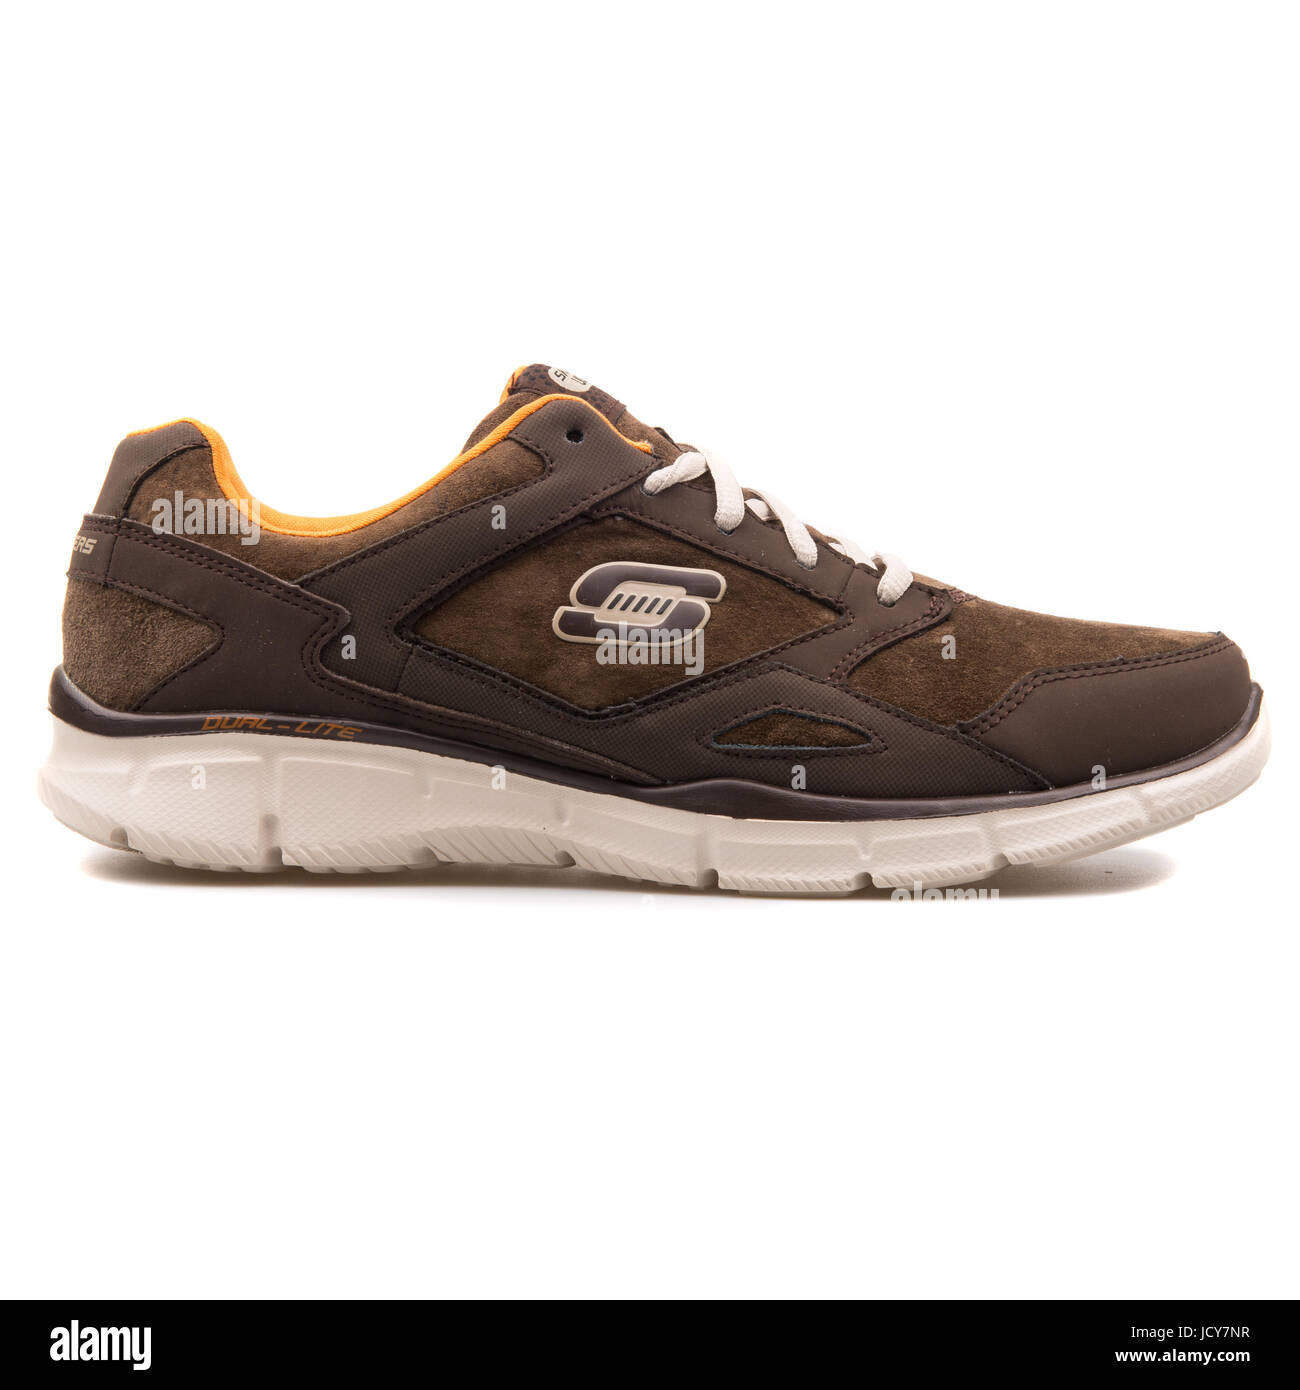 Skechers Equalizer Timepiece Brown Men's Running Shoes - 999669-BRN - Stock Image